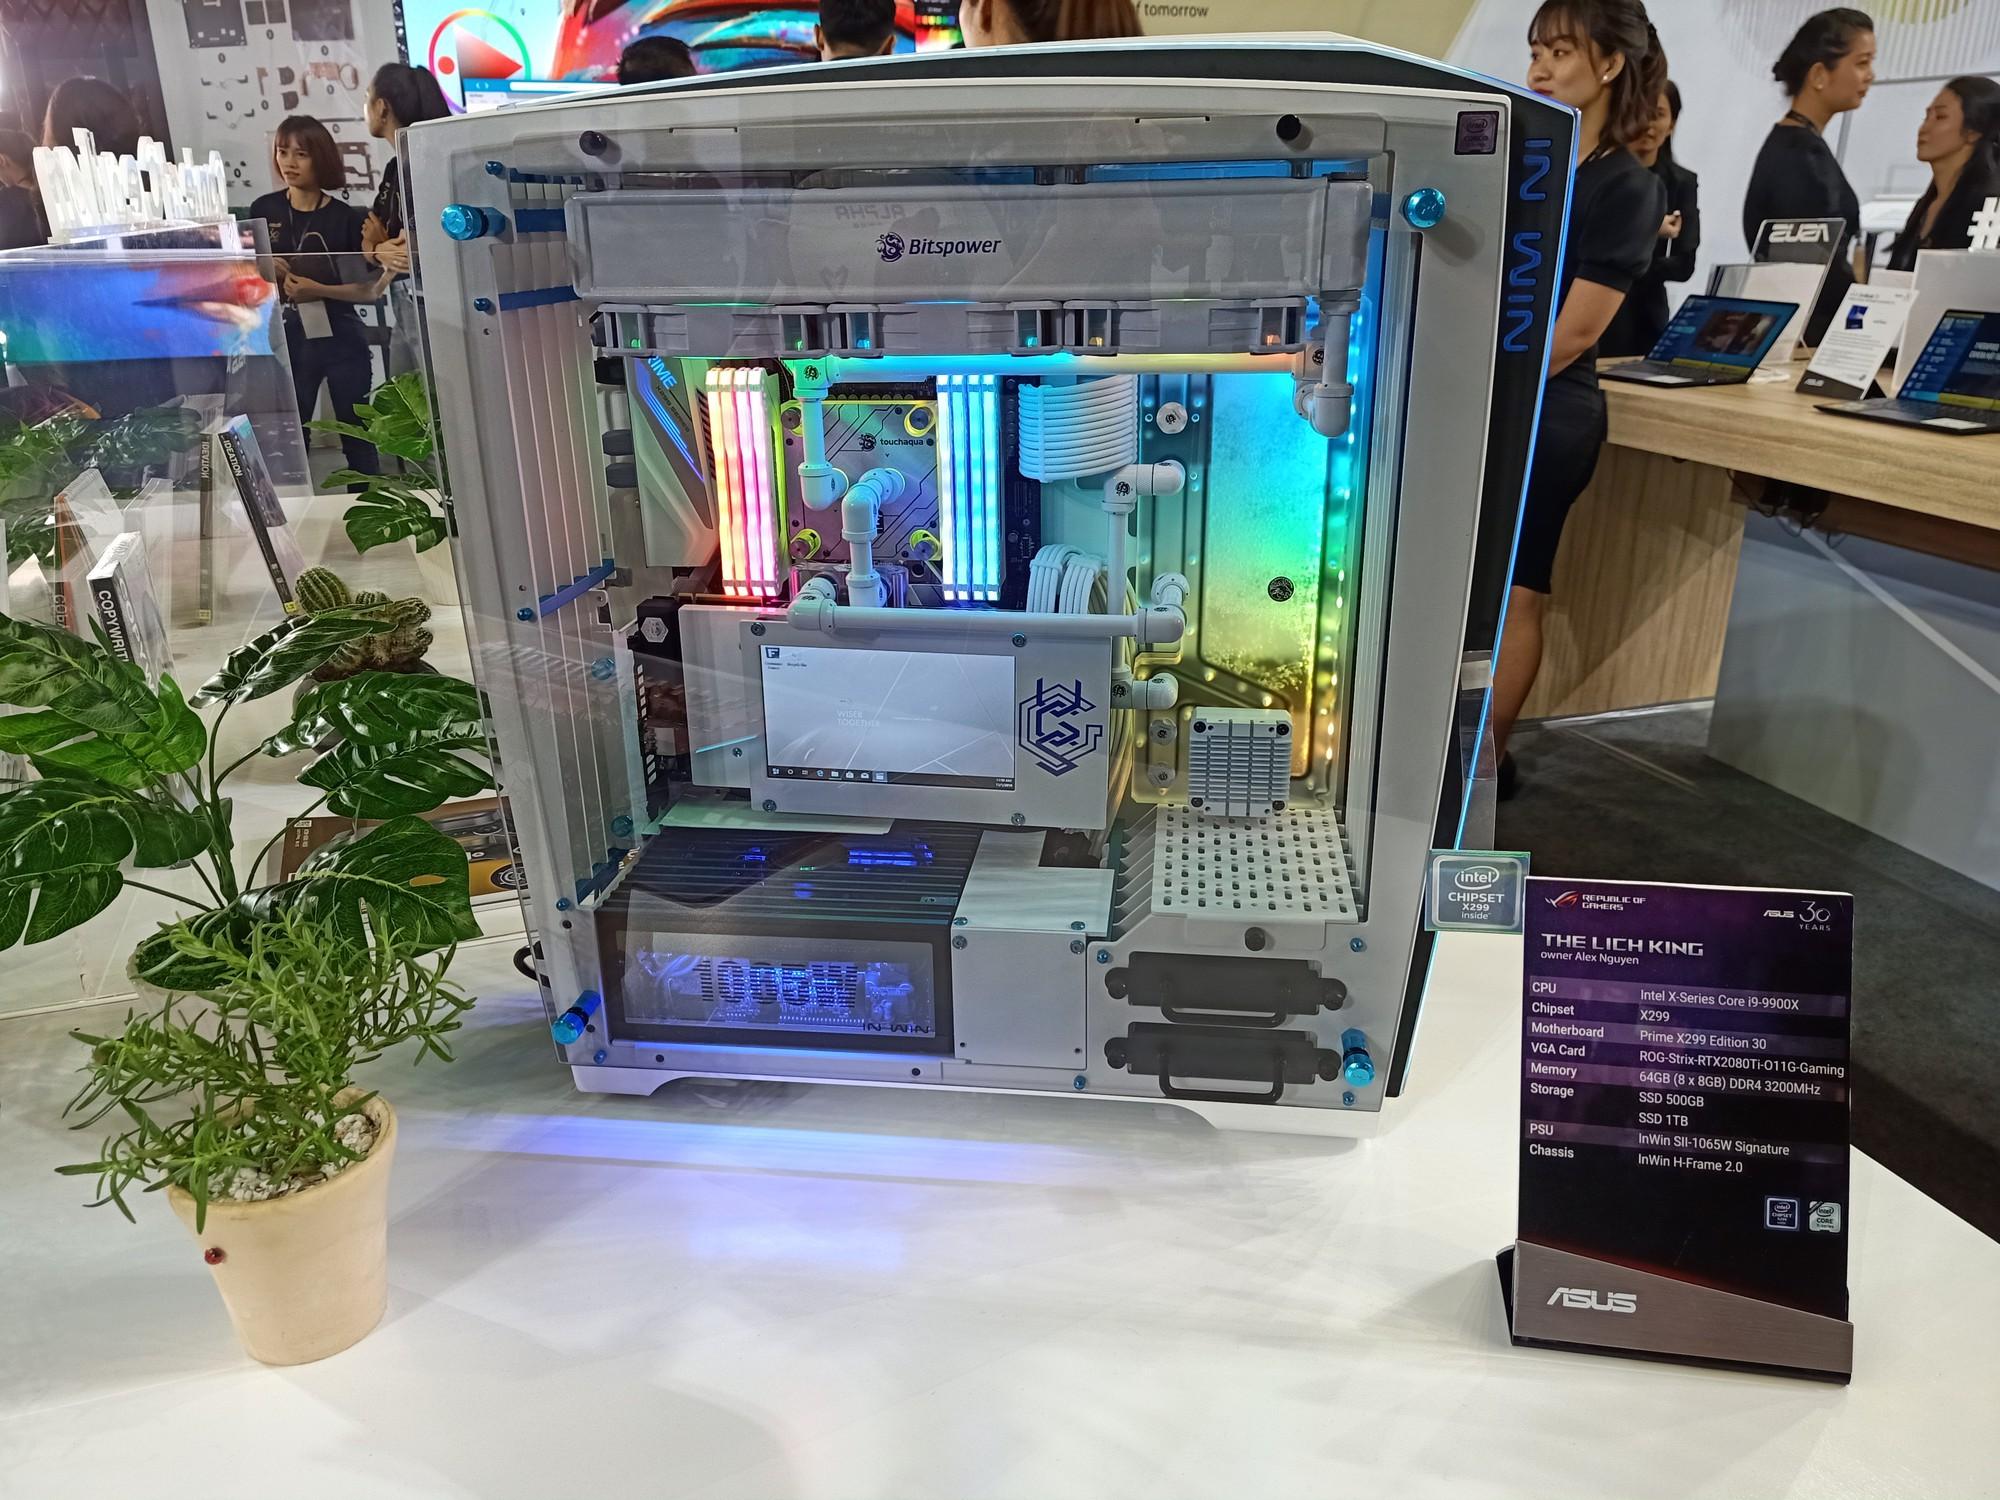 Nhung-san-pham-doc-dao-tai-trien-lam-Asus-Expo-2019 7